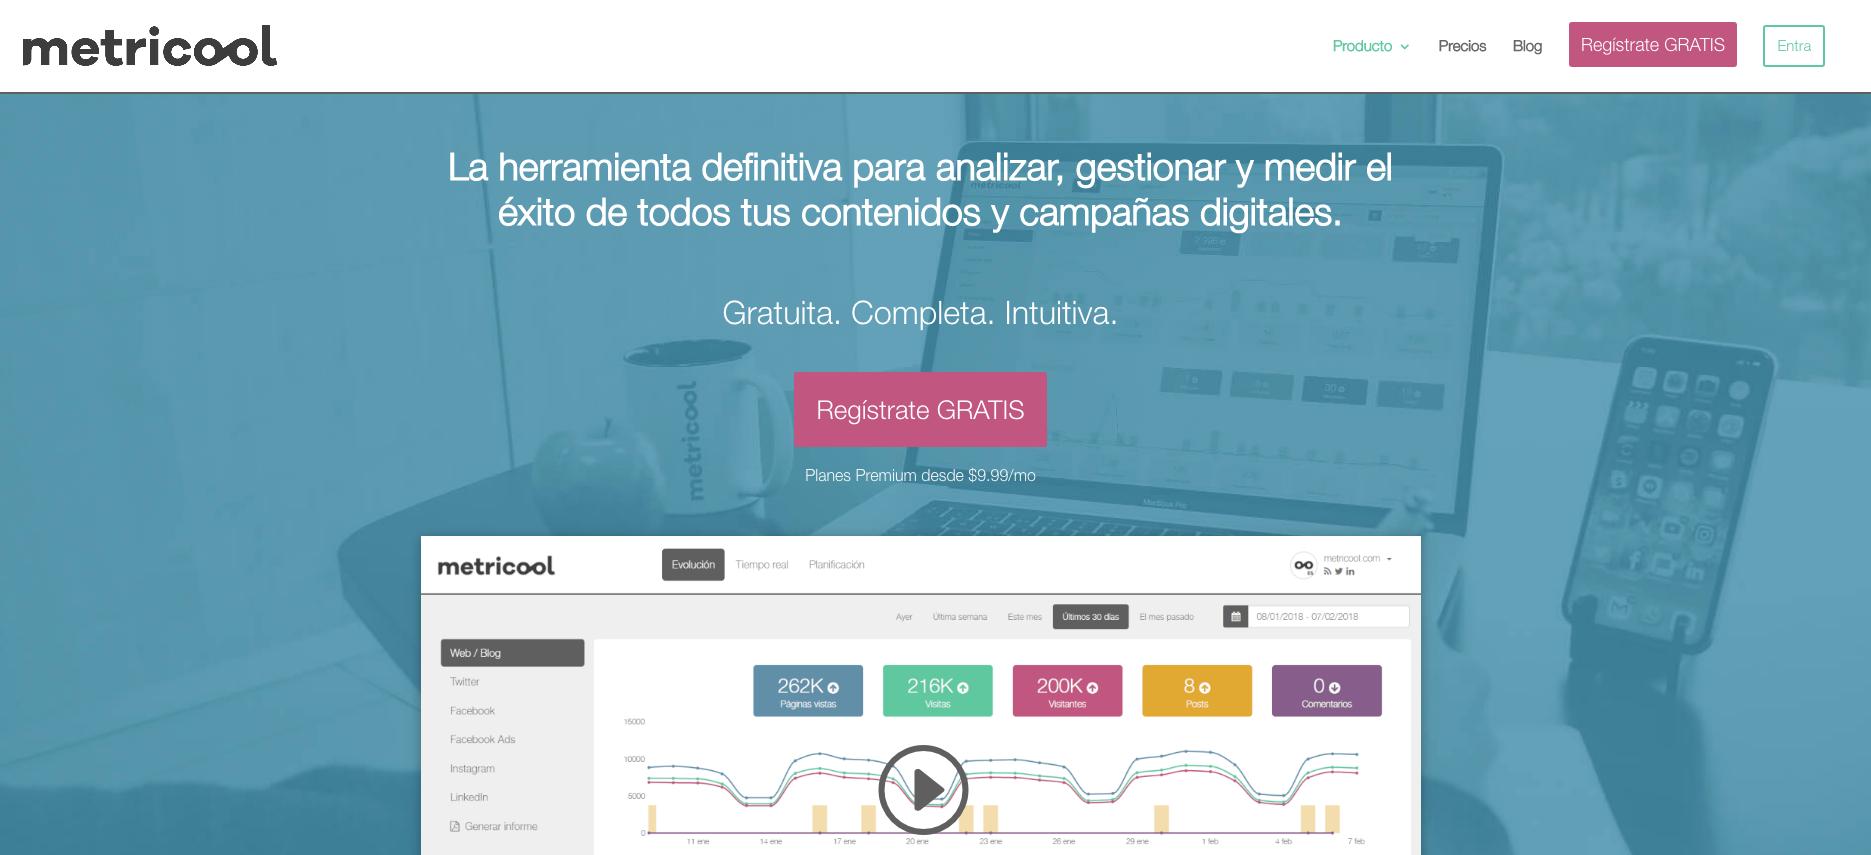 Metricool: herramientas para Redes Sociales